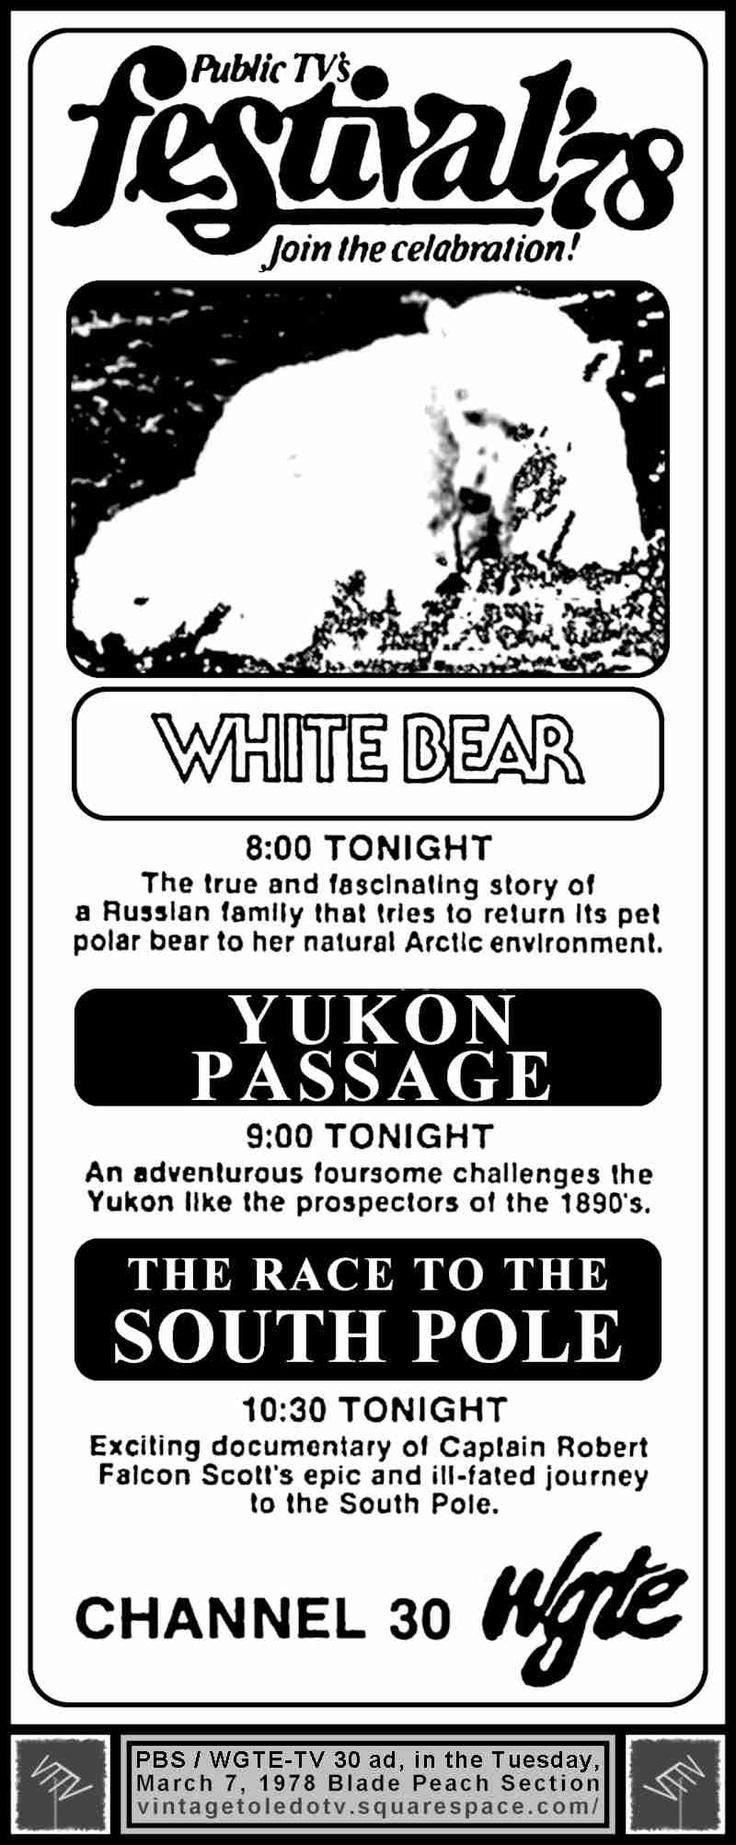 Vintage Toledo TV - PBS Ads (WBGU, WGTE, WTVS) - Festival '78 Tuesday Night Shows (3/7/78)